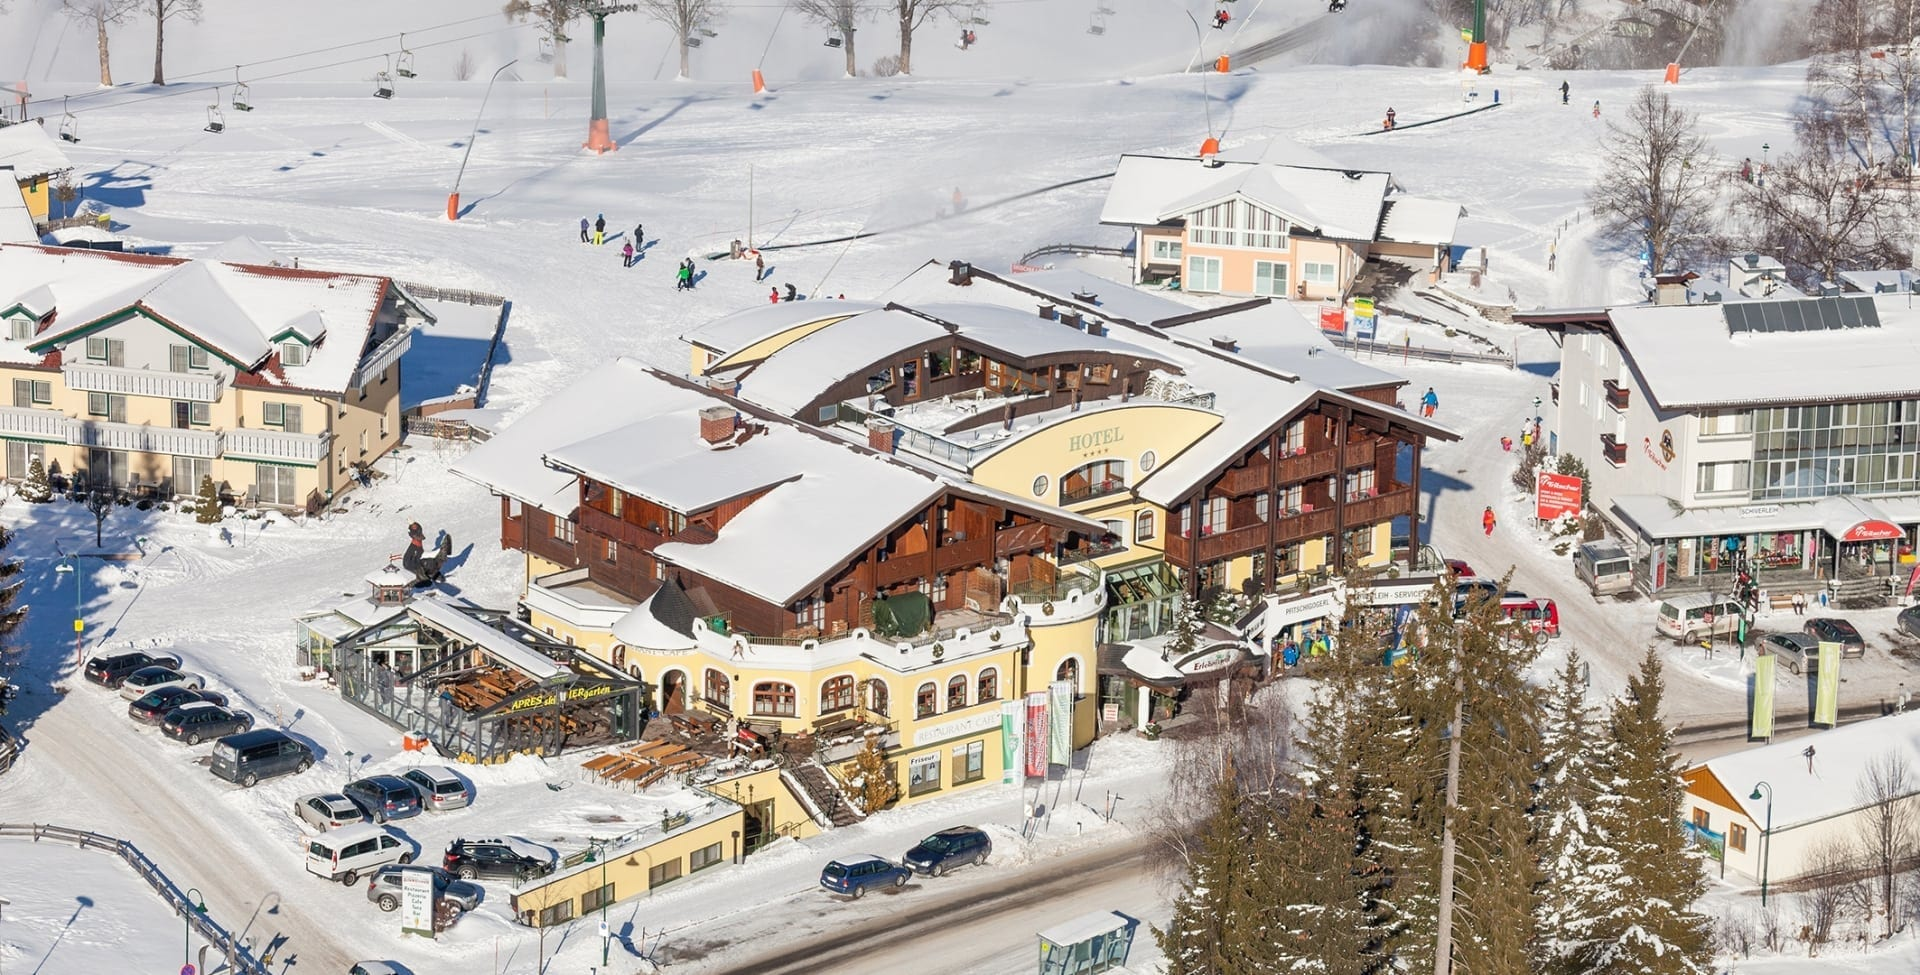 Hotel Erlebniswelt im Winter